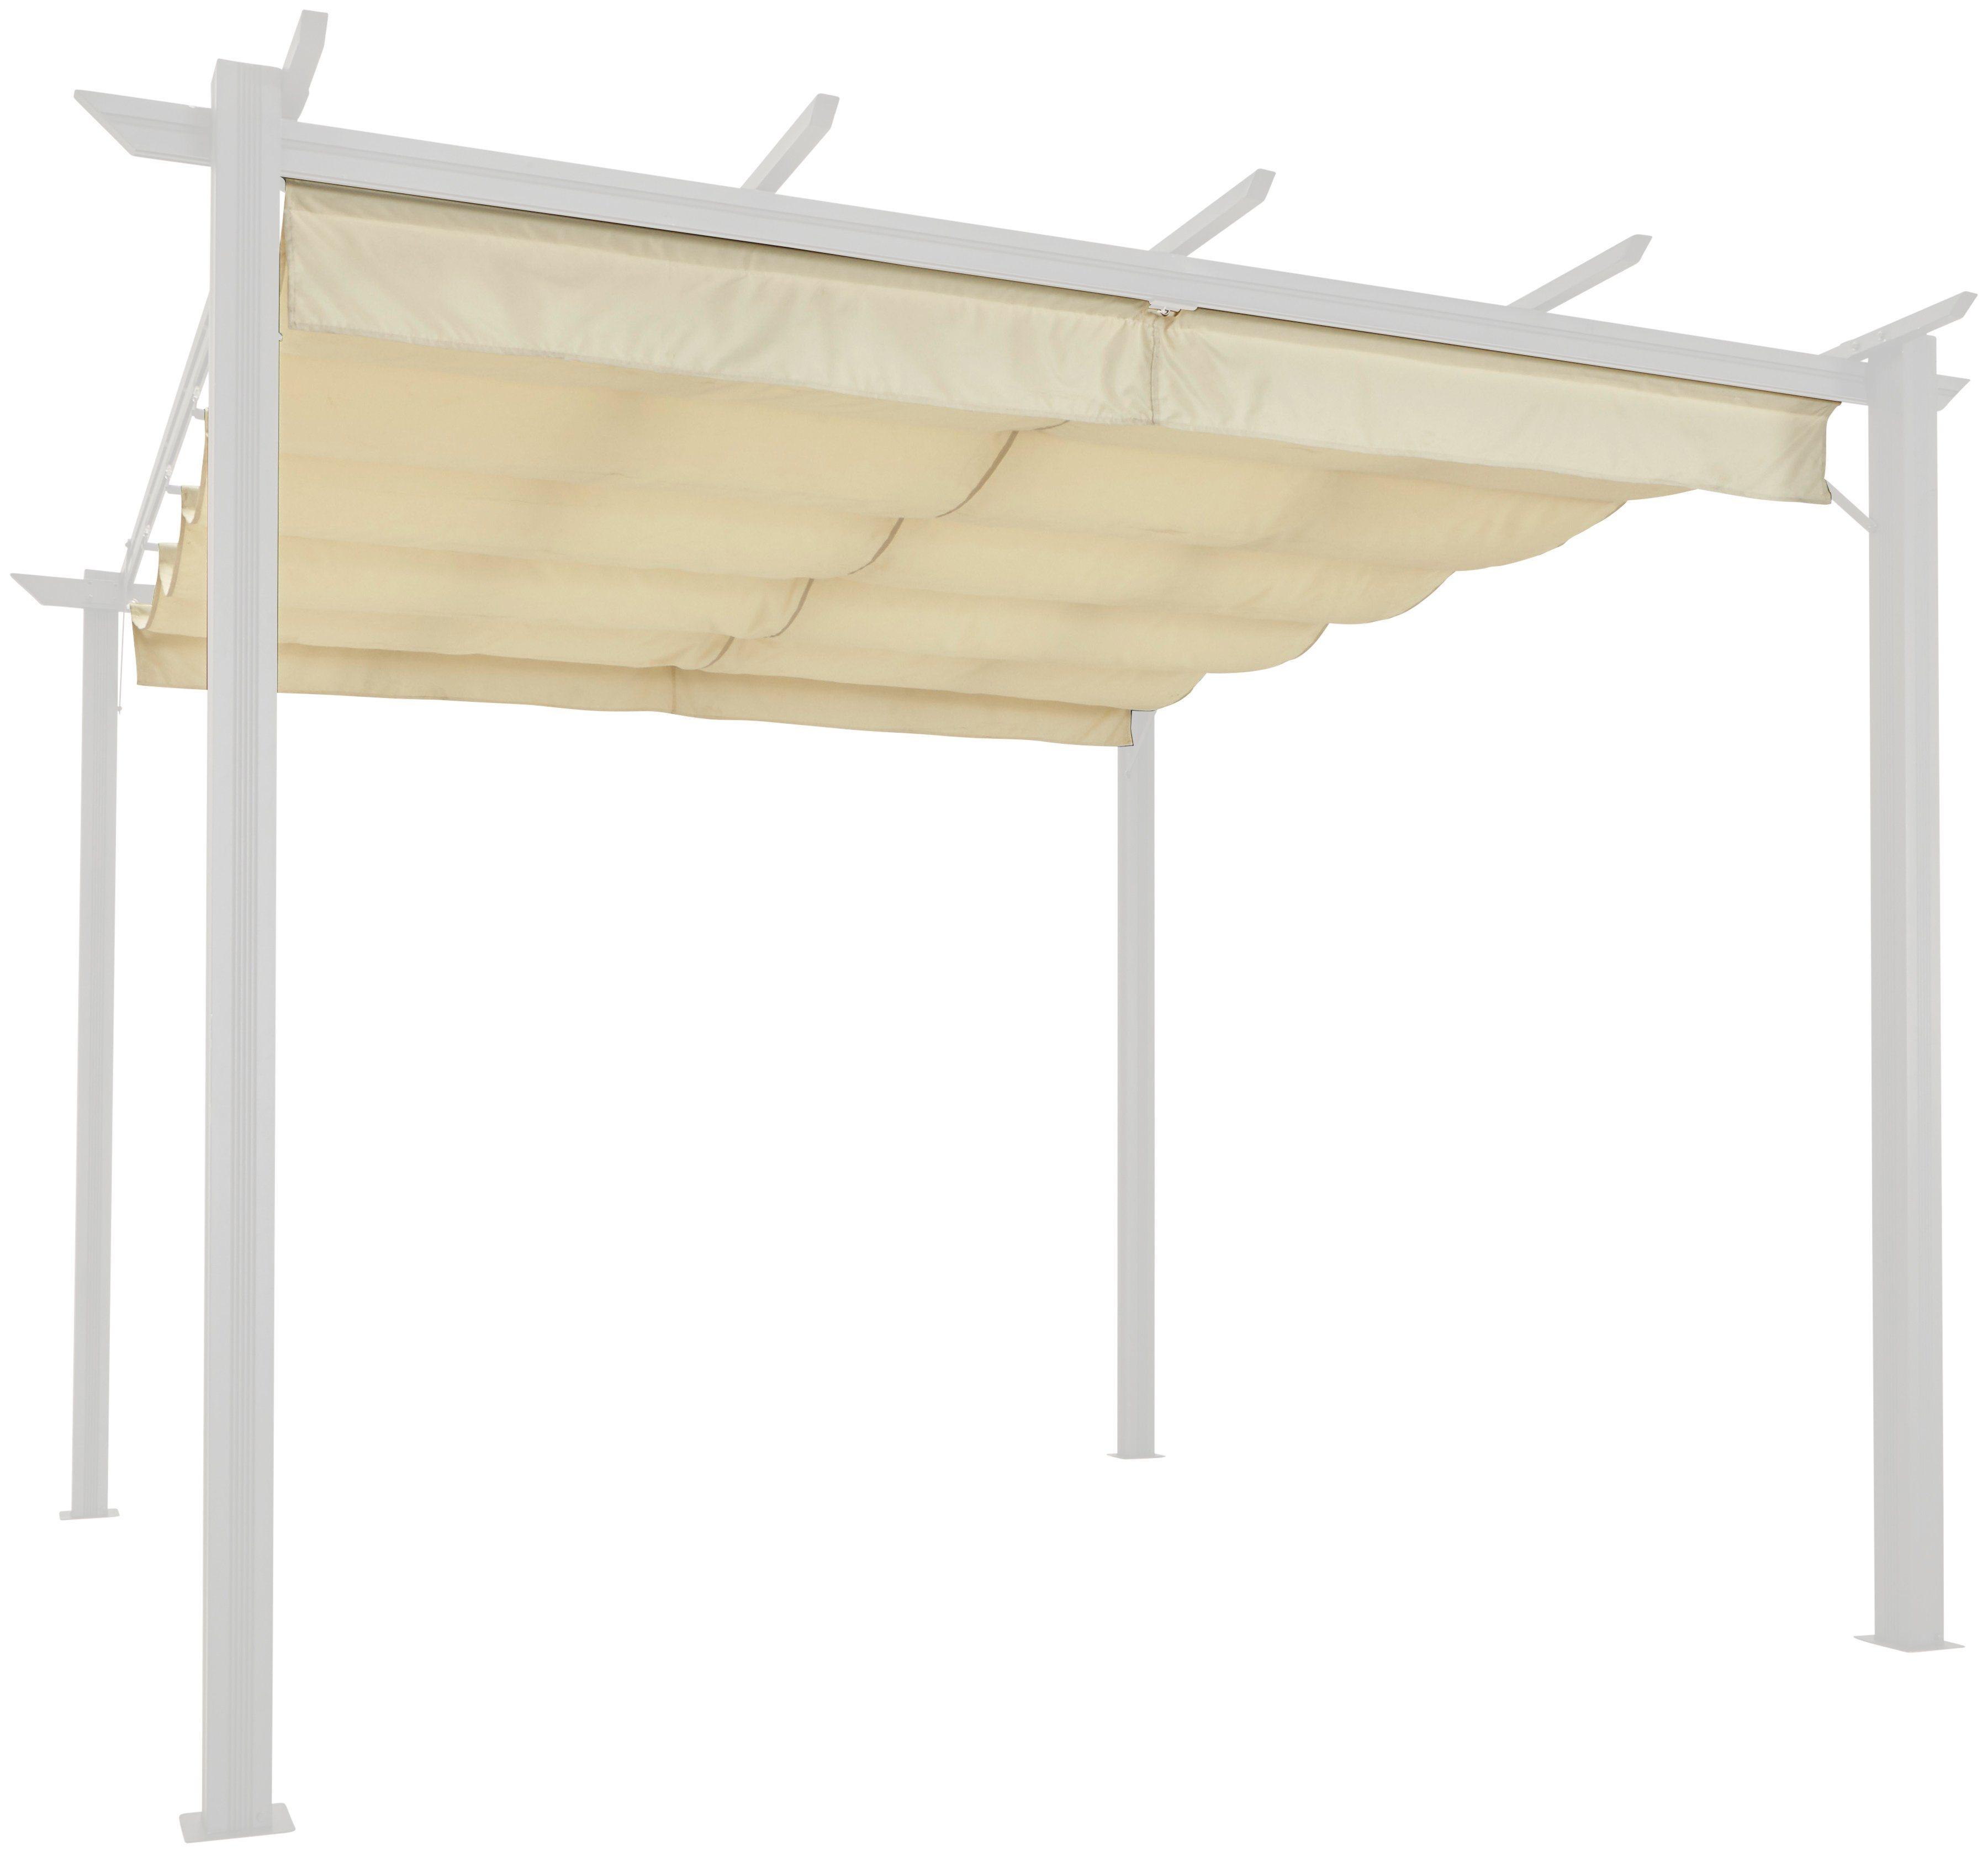 Ersatzdach für Pavillon »Aluminium«, BxL: 300x300 cm, sandfarben   Garten > Pavillons   Polyester